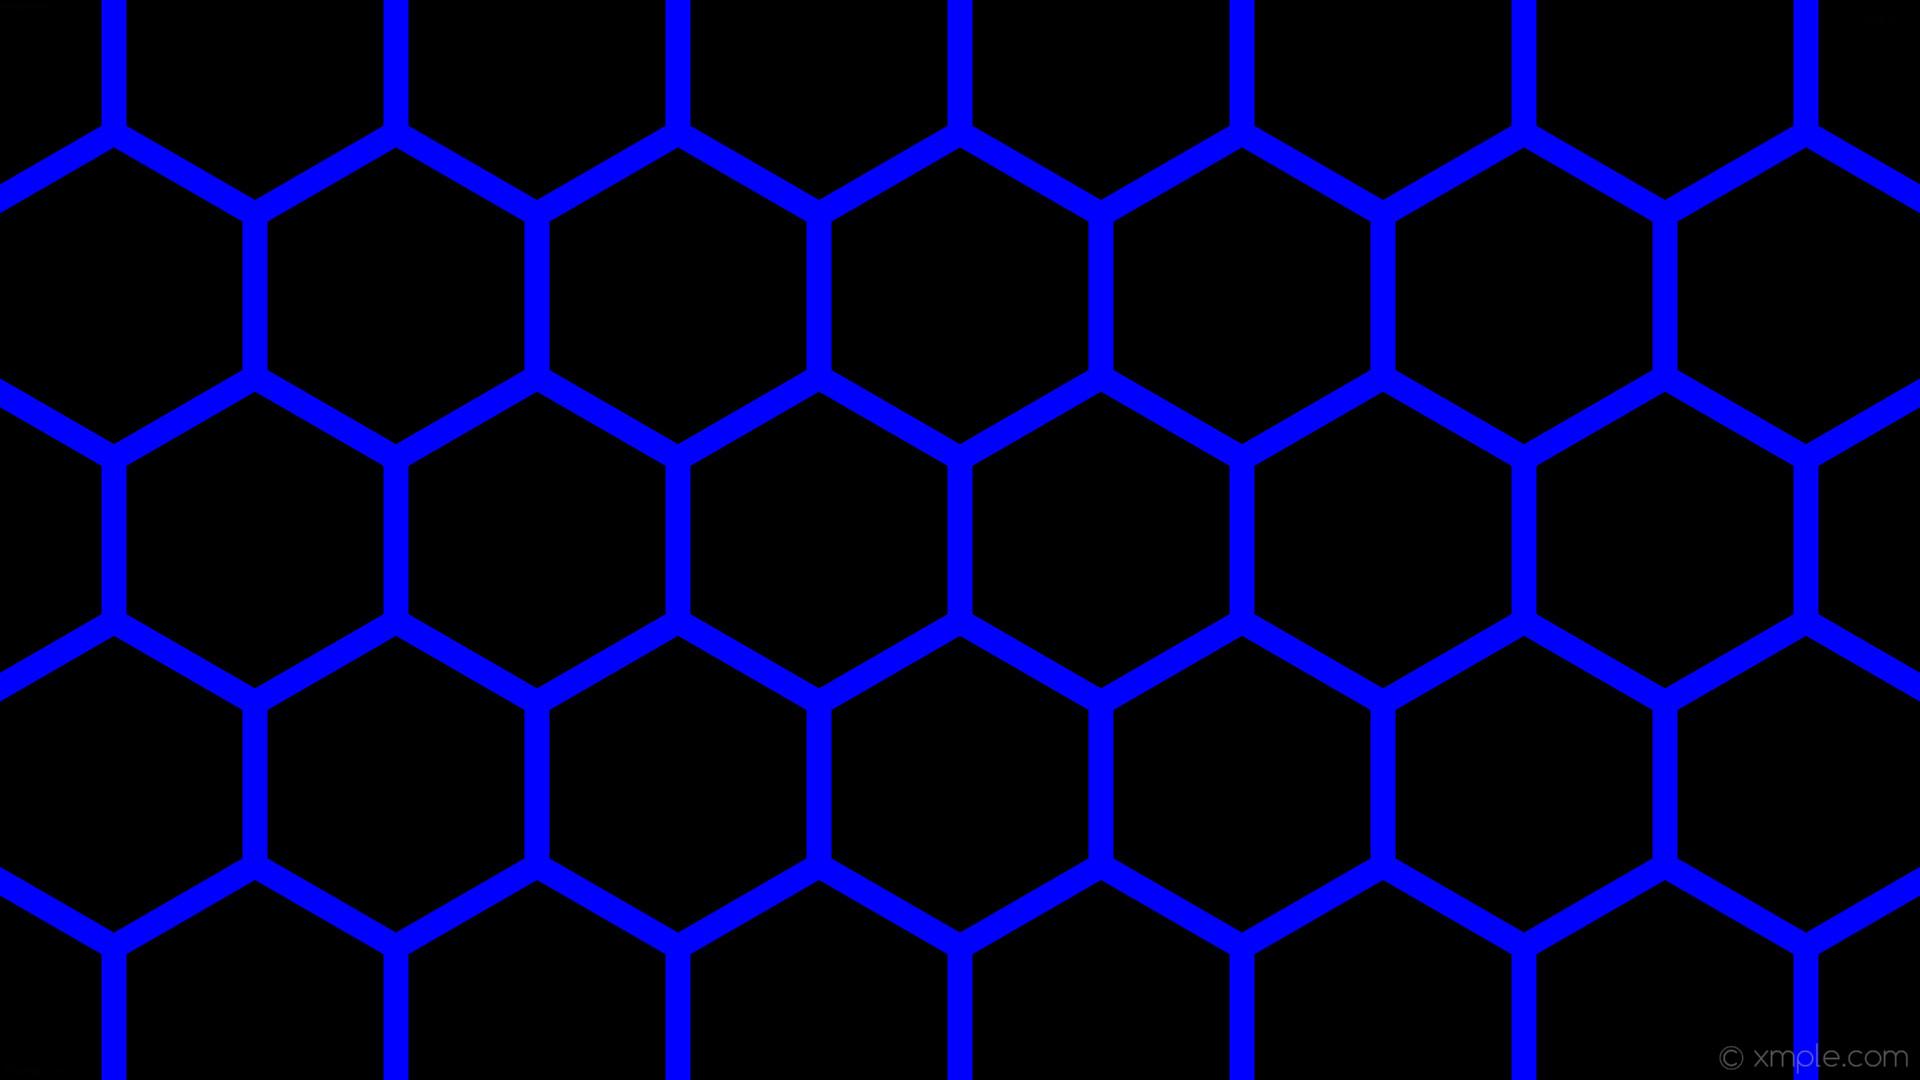 wallpaper beehive black honeycomb blue hexagon #000000 #0000ff 0° 25px 282px